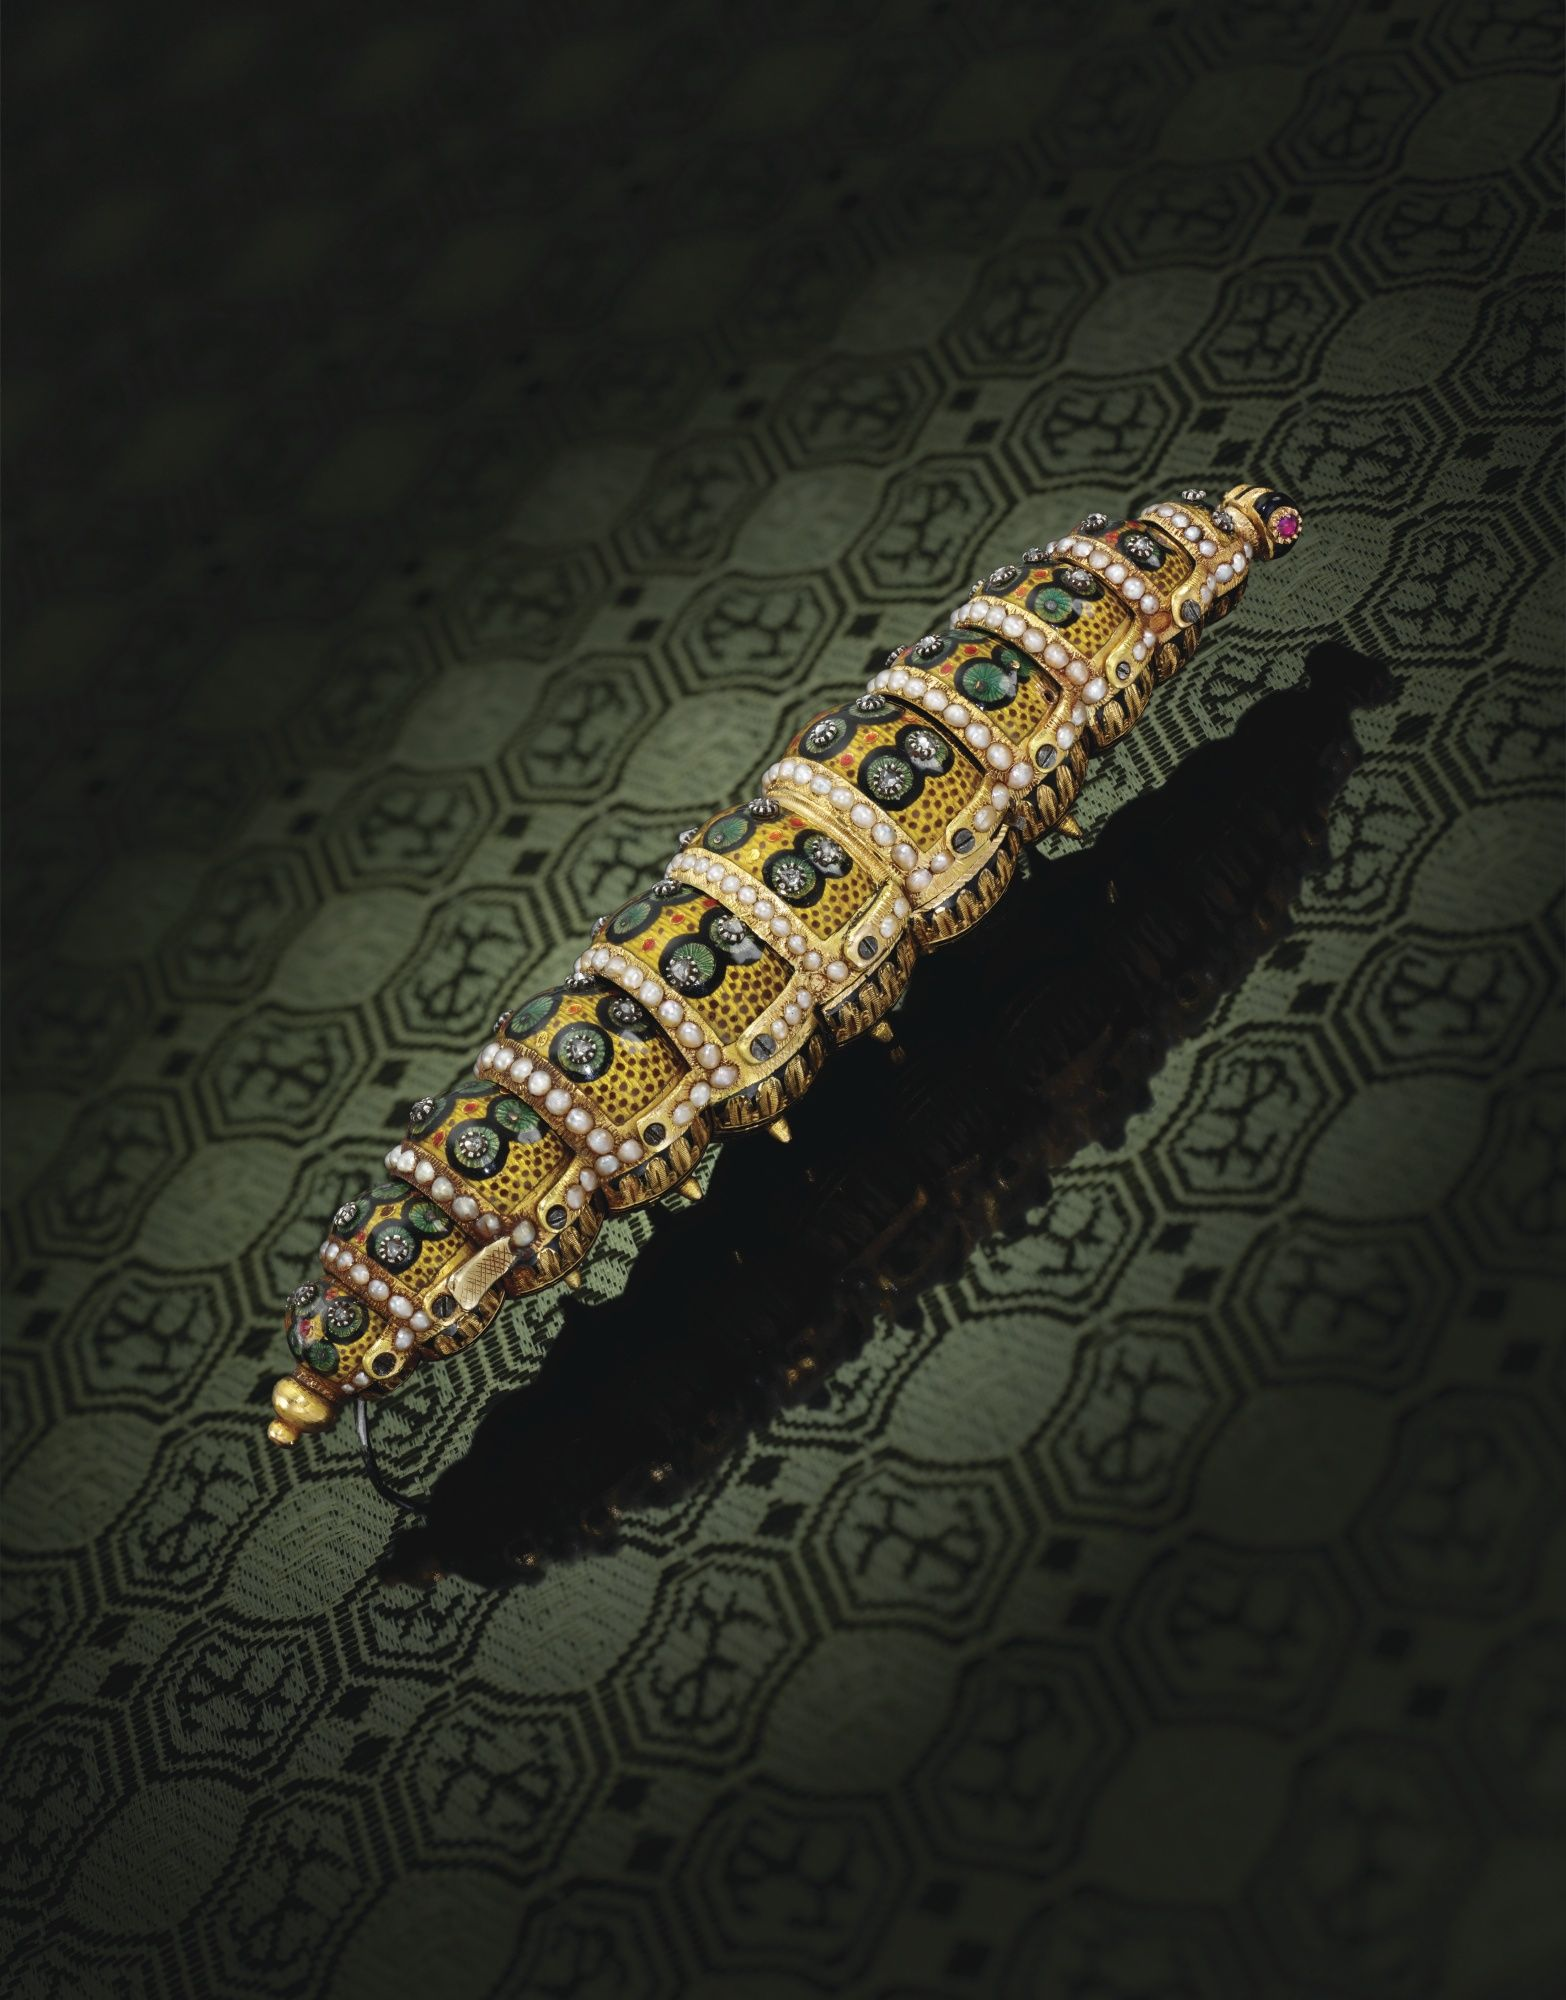 Ethiopian Caterpillar, a jewelled gold automaton 1810 Geneva.